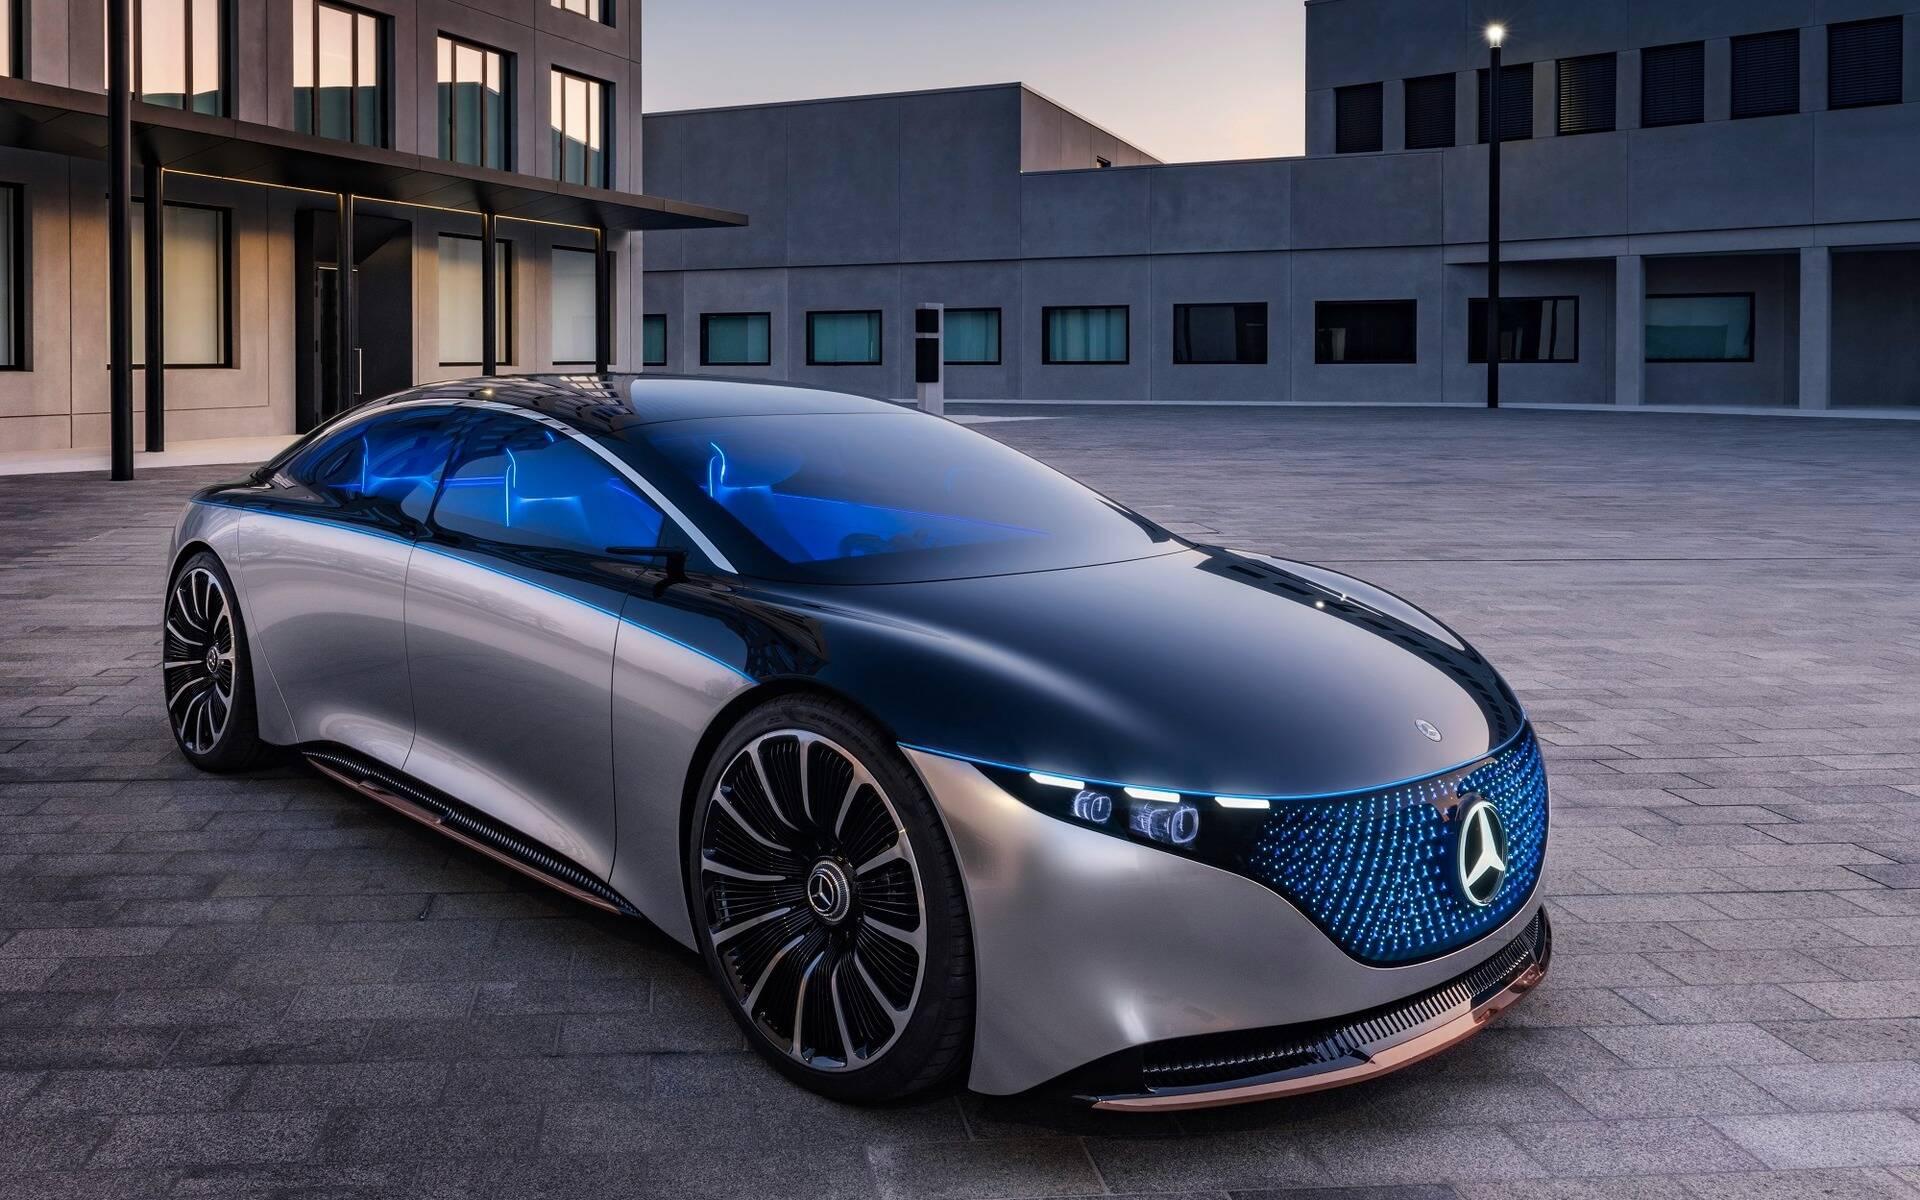 <p>Mercedes-Benz Concept Vision EQS</p>